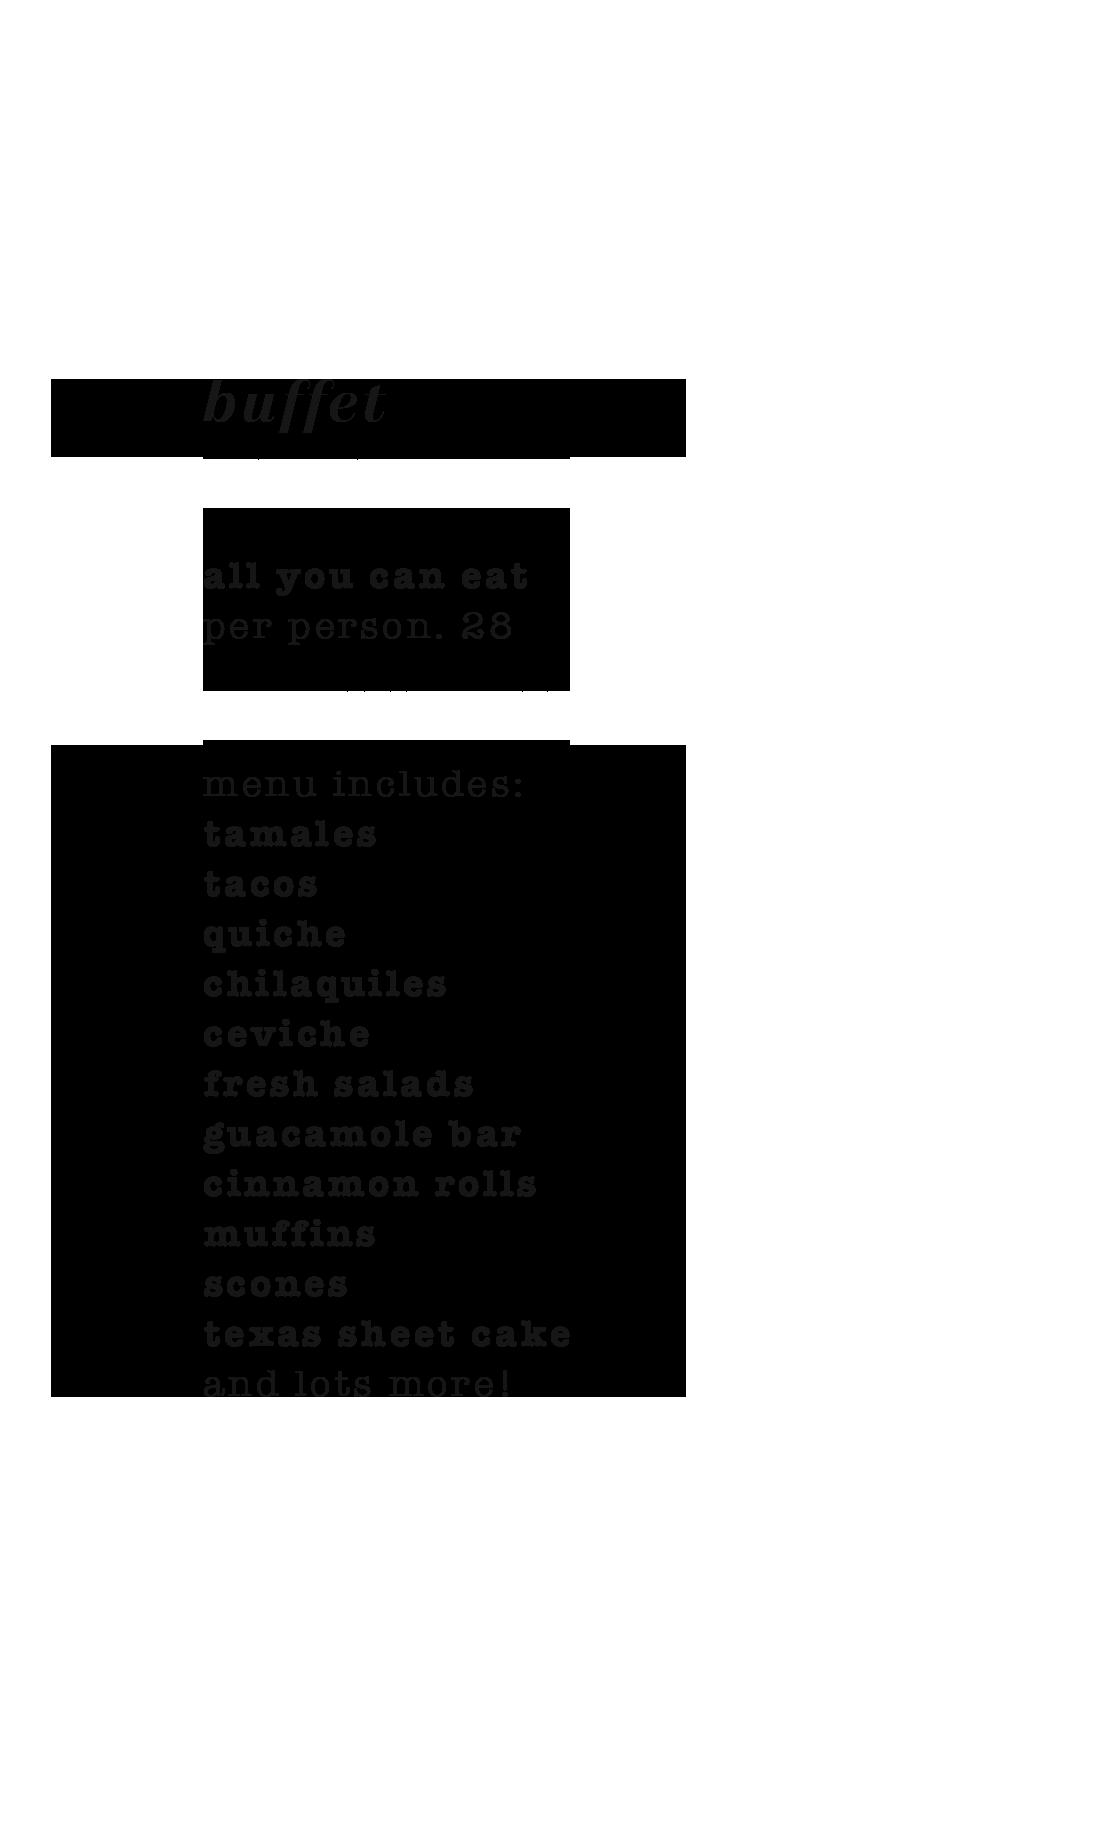 Buffet_Menu.png